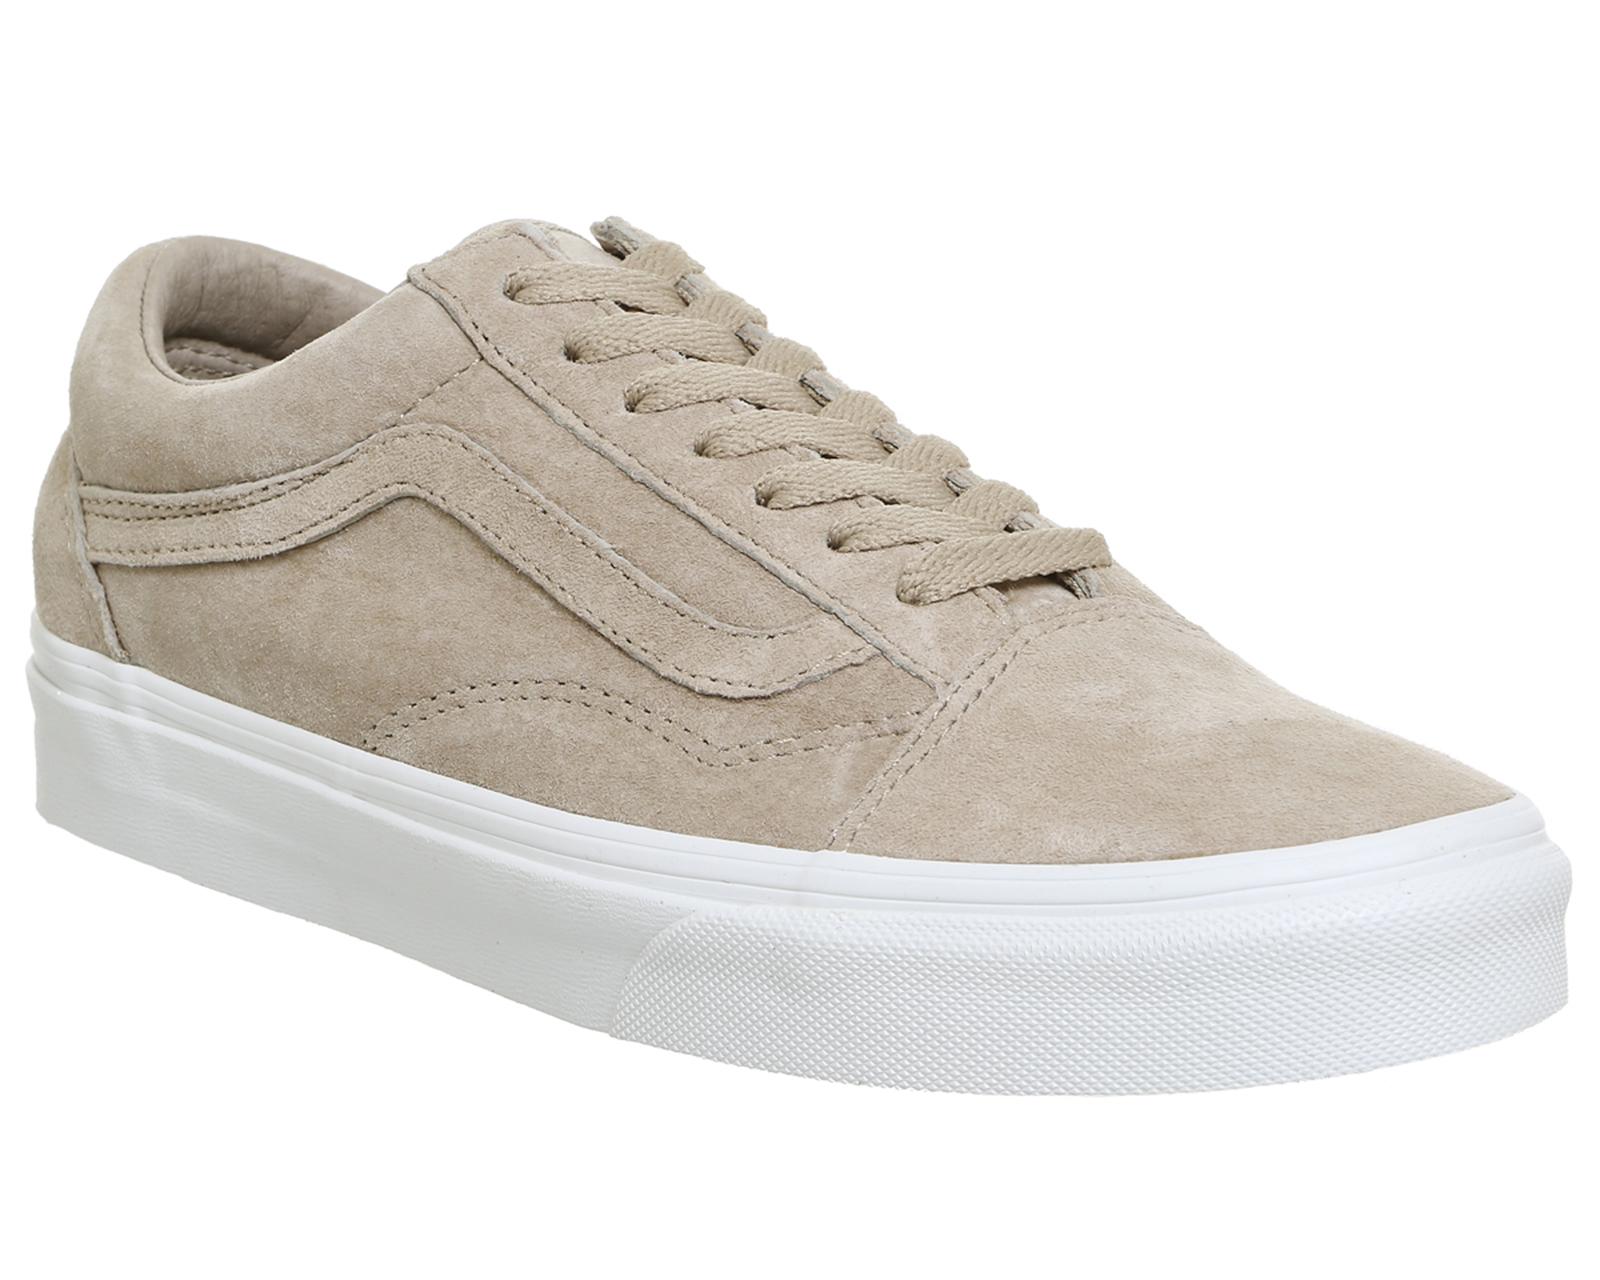 mens vans old skool hummus suede true white trainers shoes. Black Bedroom Furniture Sets. Home Design Ideas